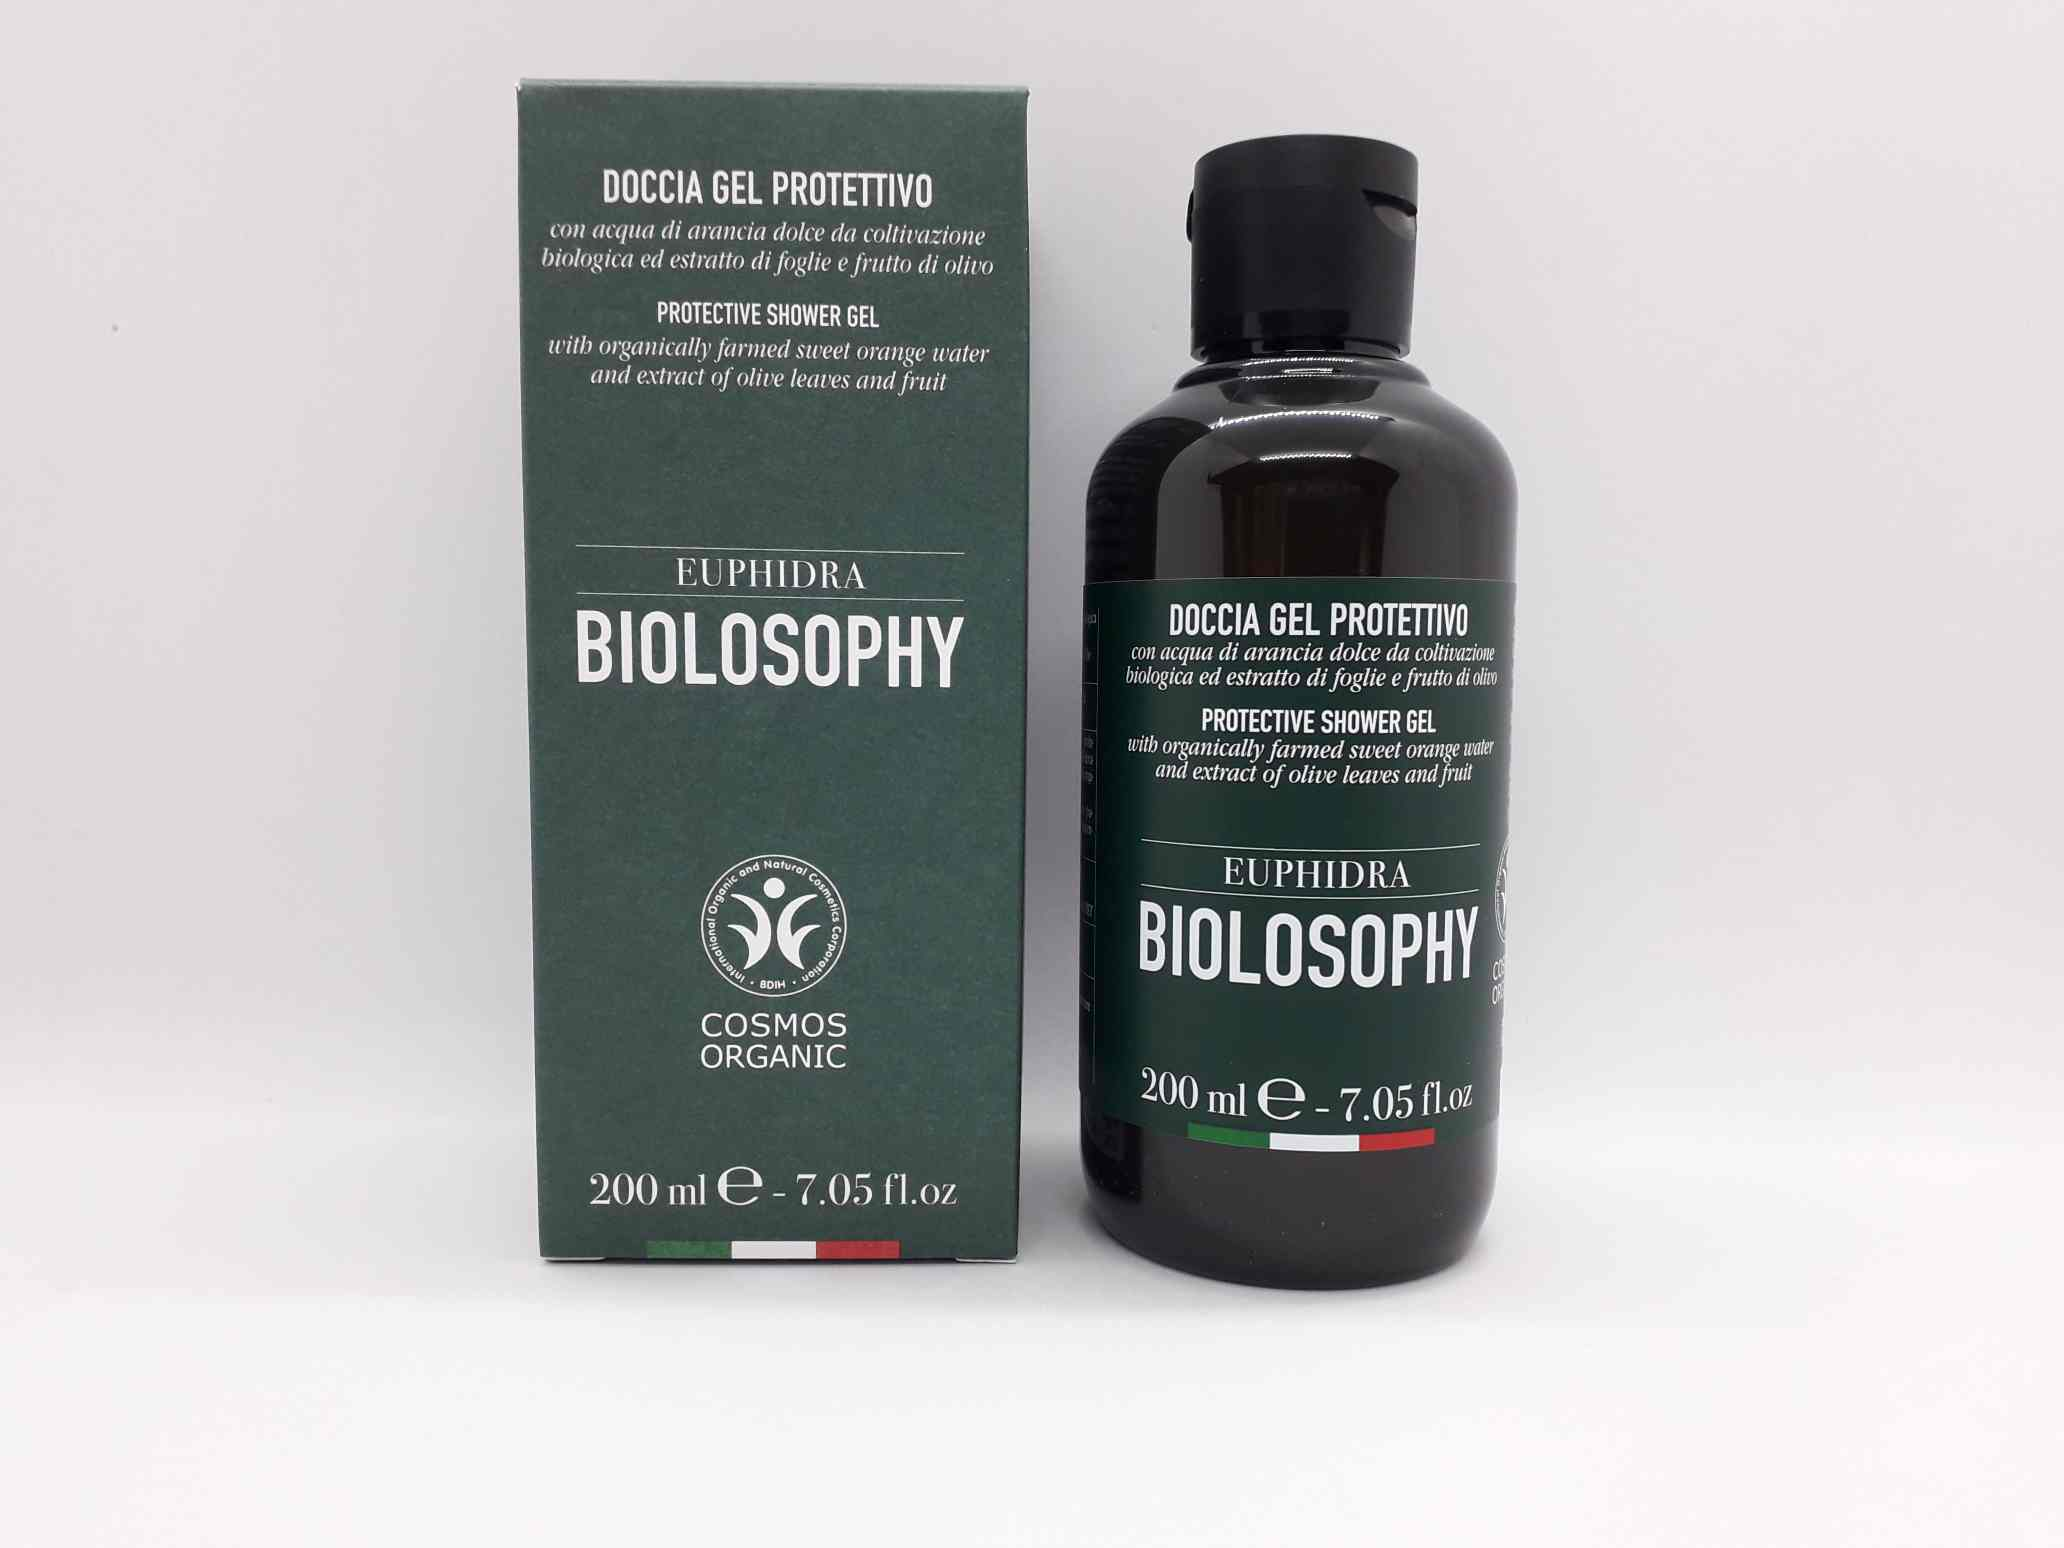 EUPHIDRA BIOLOSOPHY DOCCIA GEL PROTETTIVO 200 ML - Farmaciaempatica.it